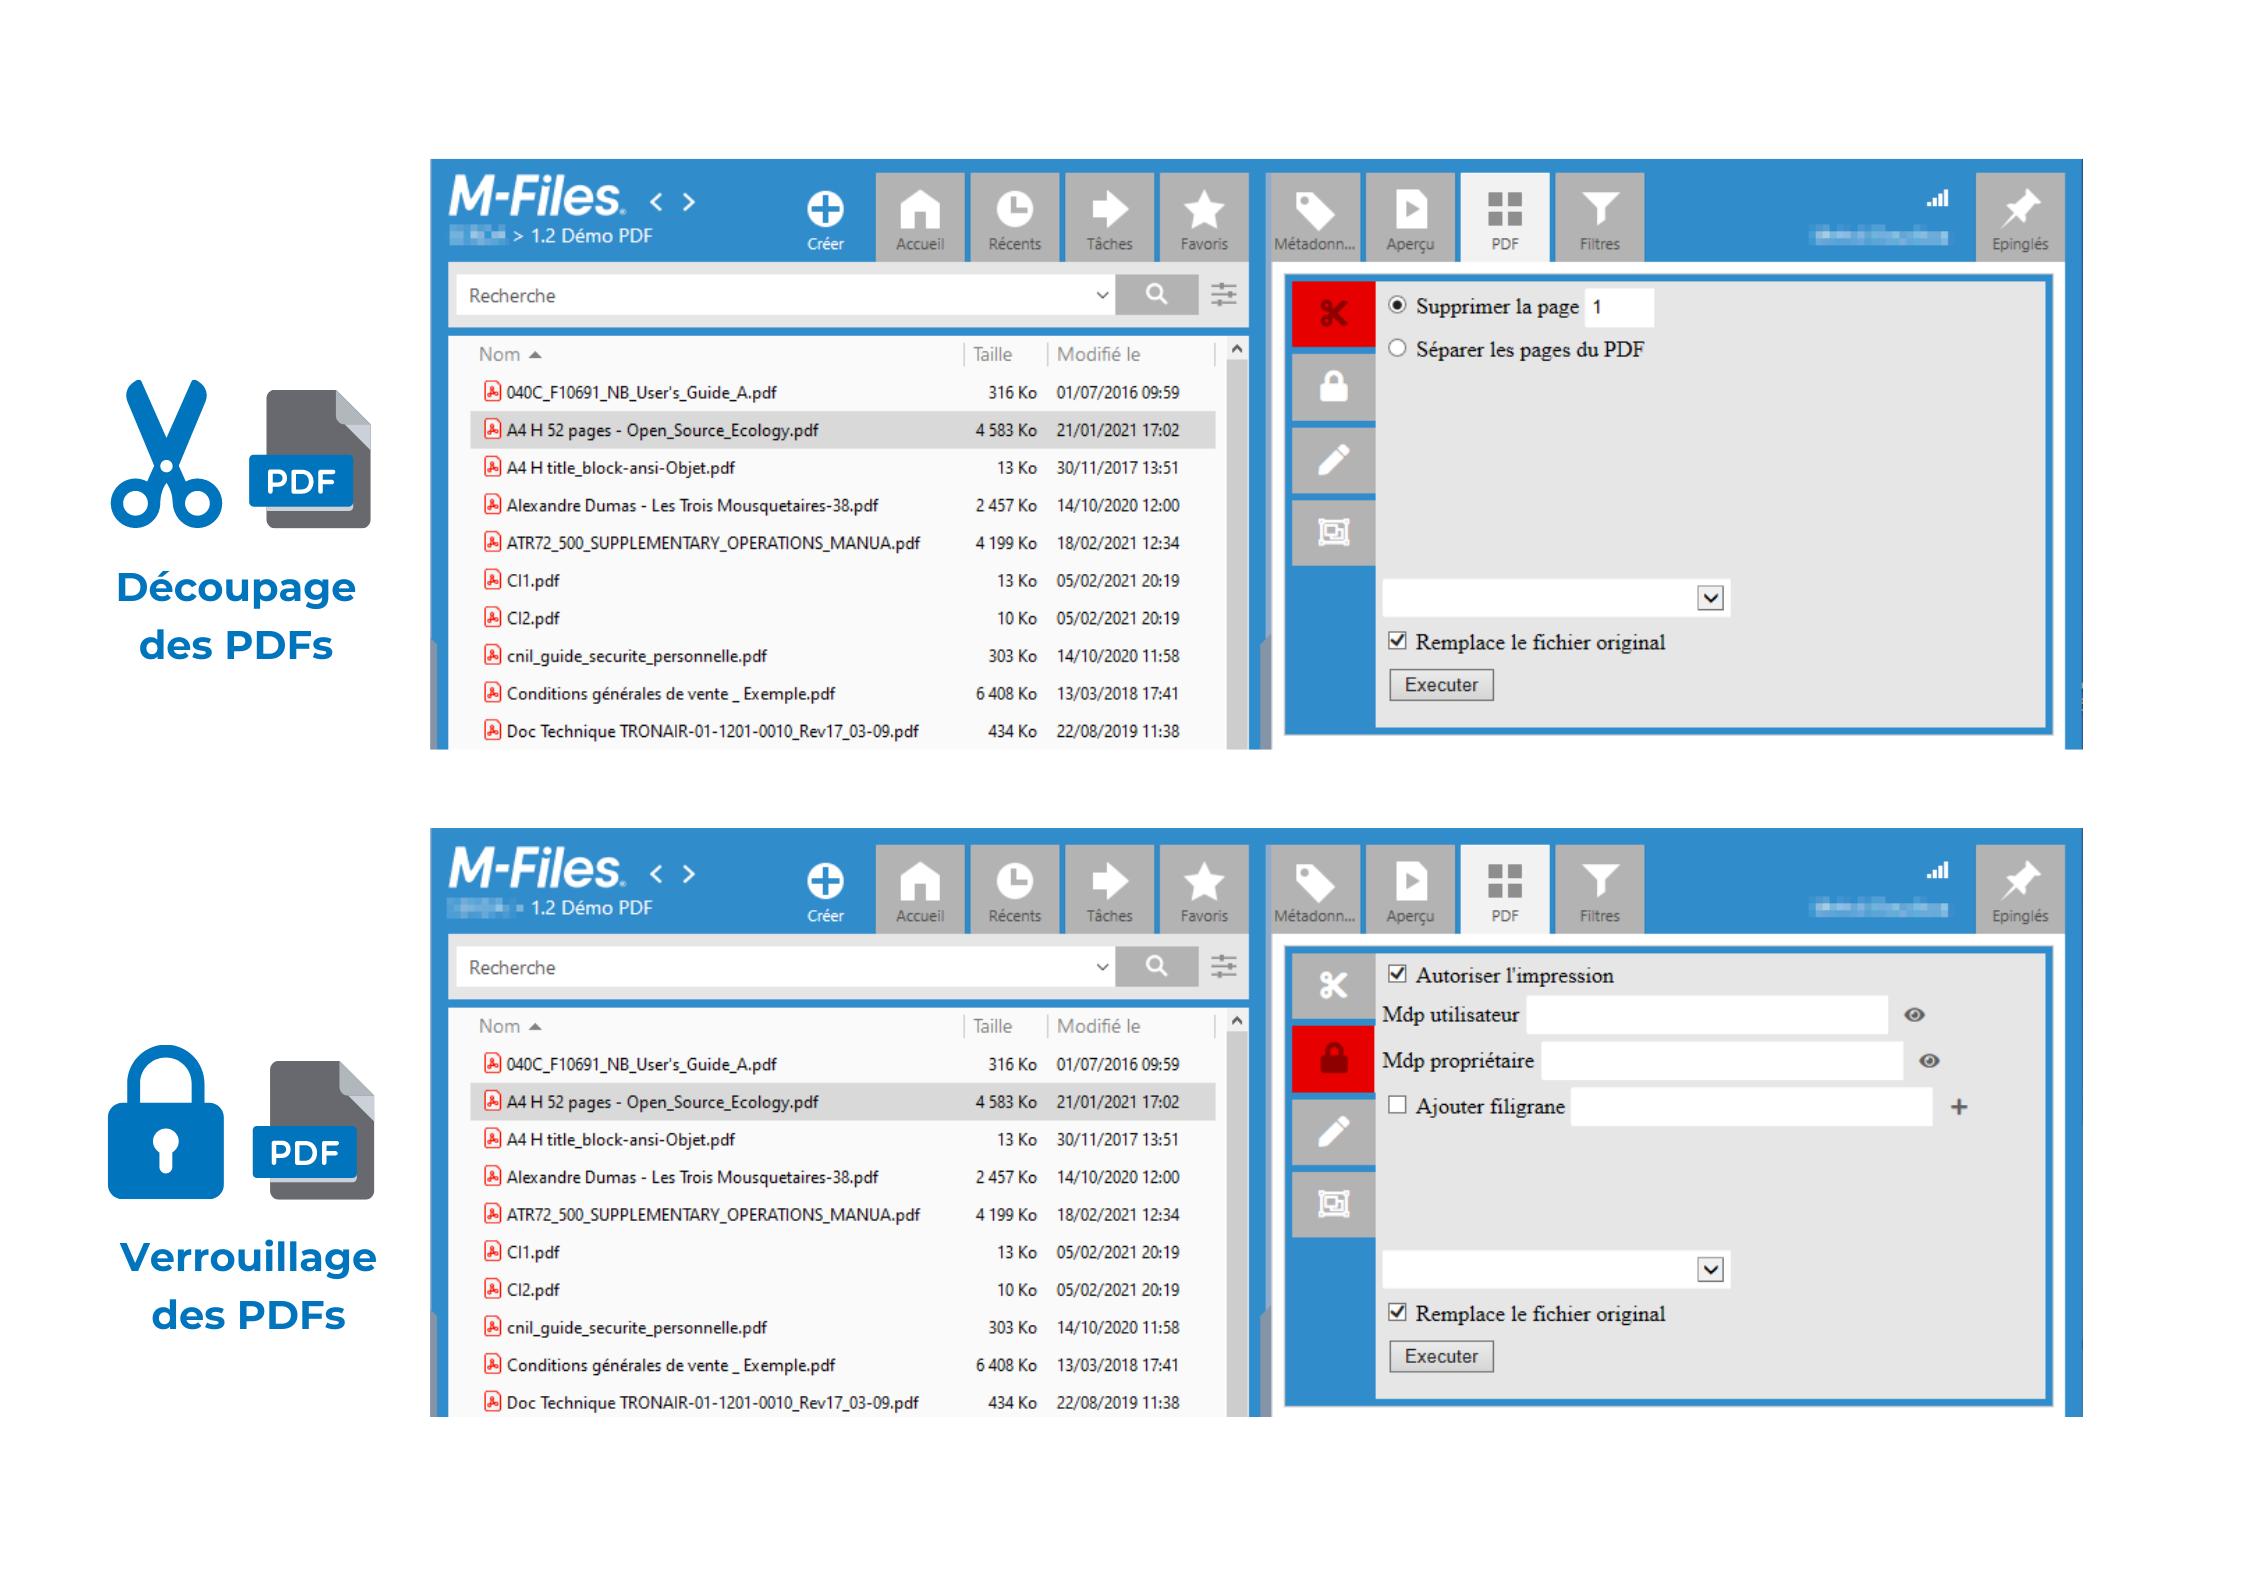 PDF Manager Verrouillage Decoupage